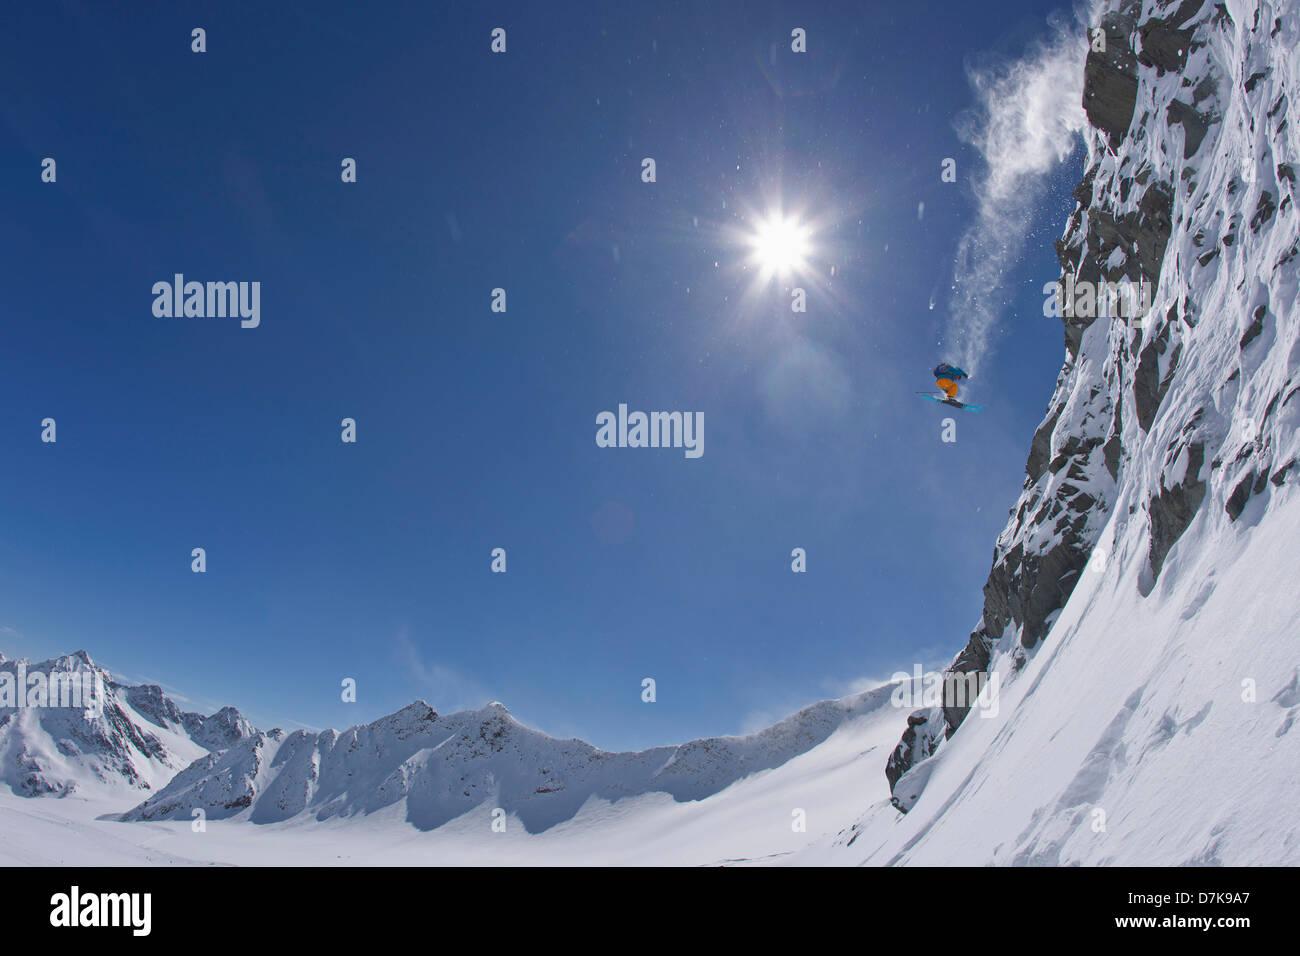 Austria, Tirol, Young man doing freeride skiing - Stock Image